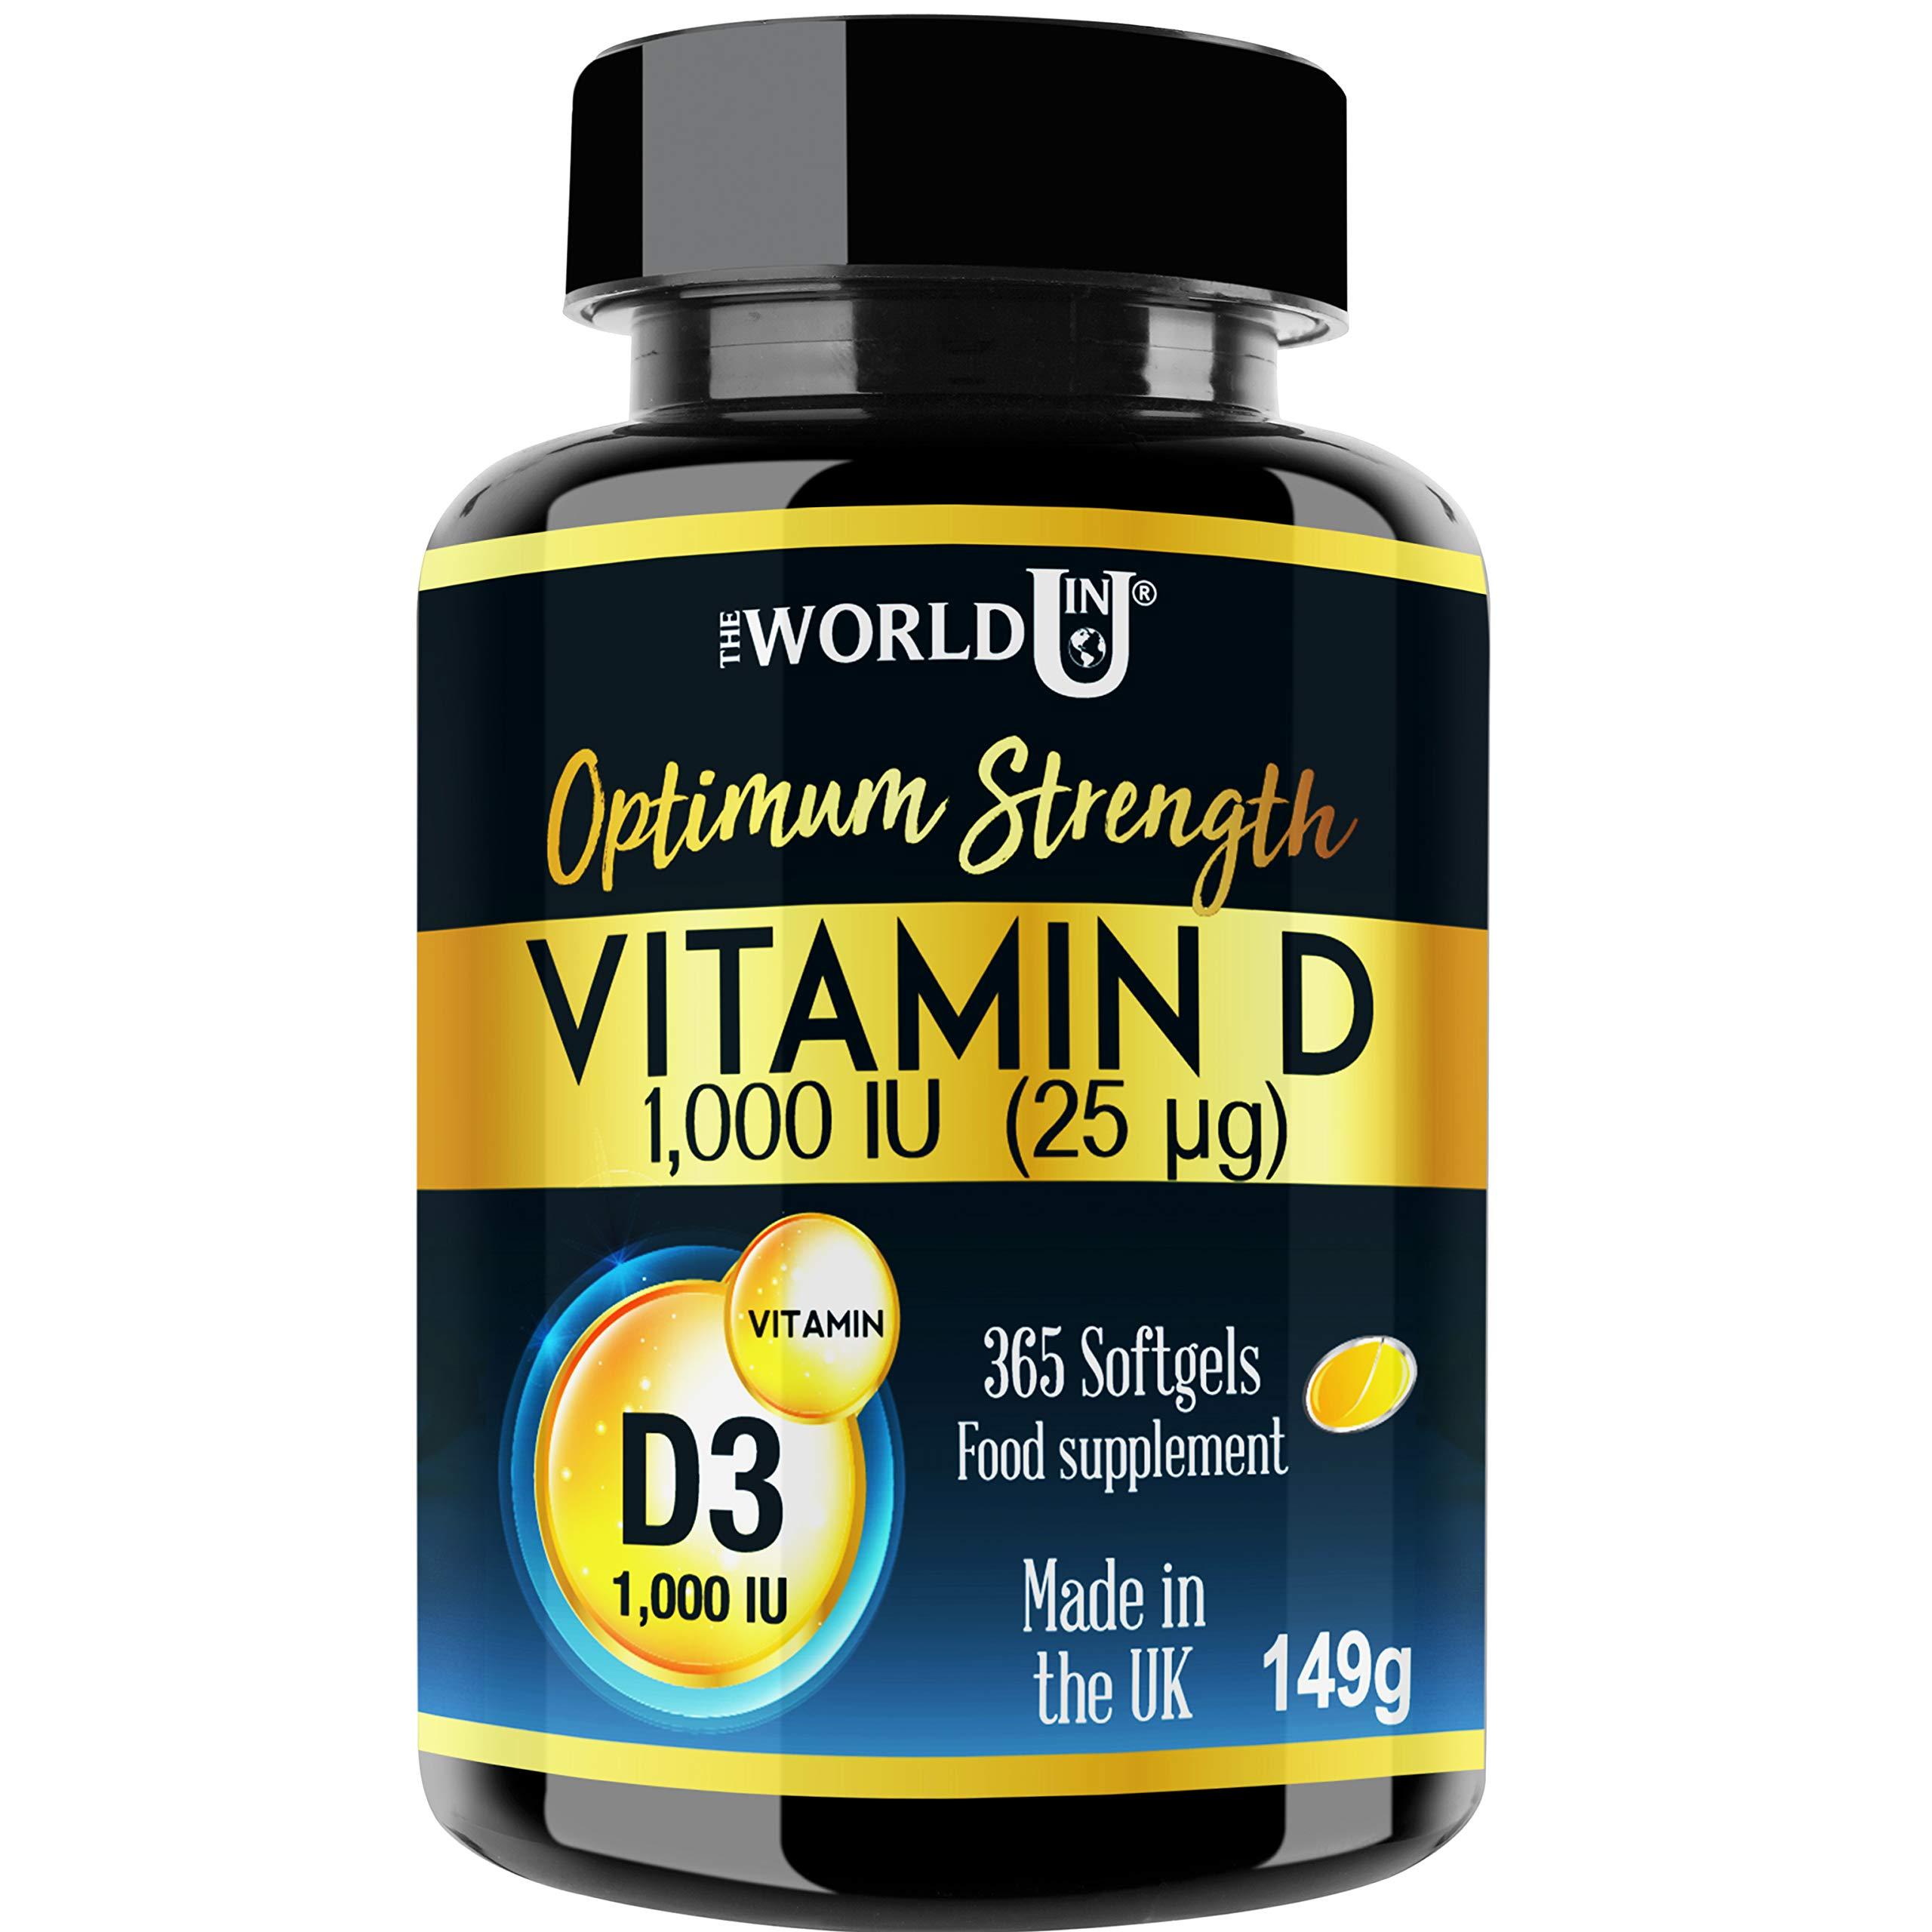 ec33830d165 Vitamin D3 1000IU 365 Softgels Rapid Absorption Vitamin D for Maintaining  Normal Bones and Teeth